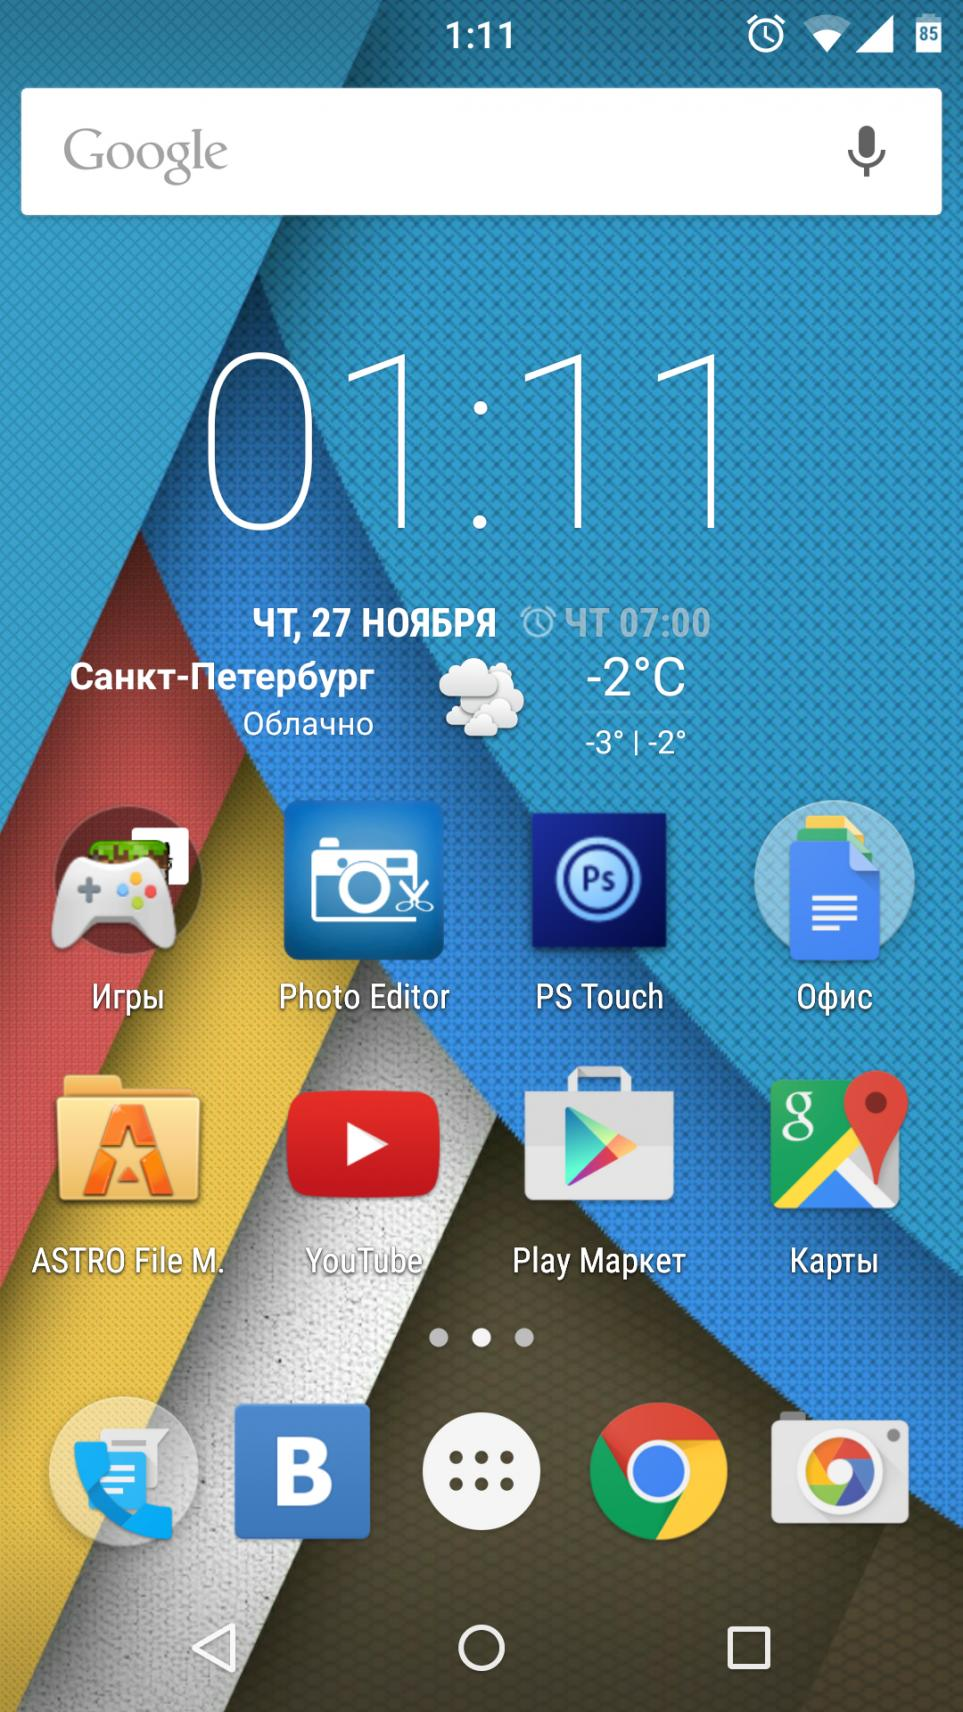 Click image for larger version  Name:Screenshot_2014-11-27-01-11-51.jpg Views:10496 Size:227.7 KB ID:3035599